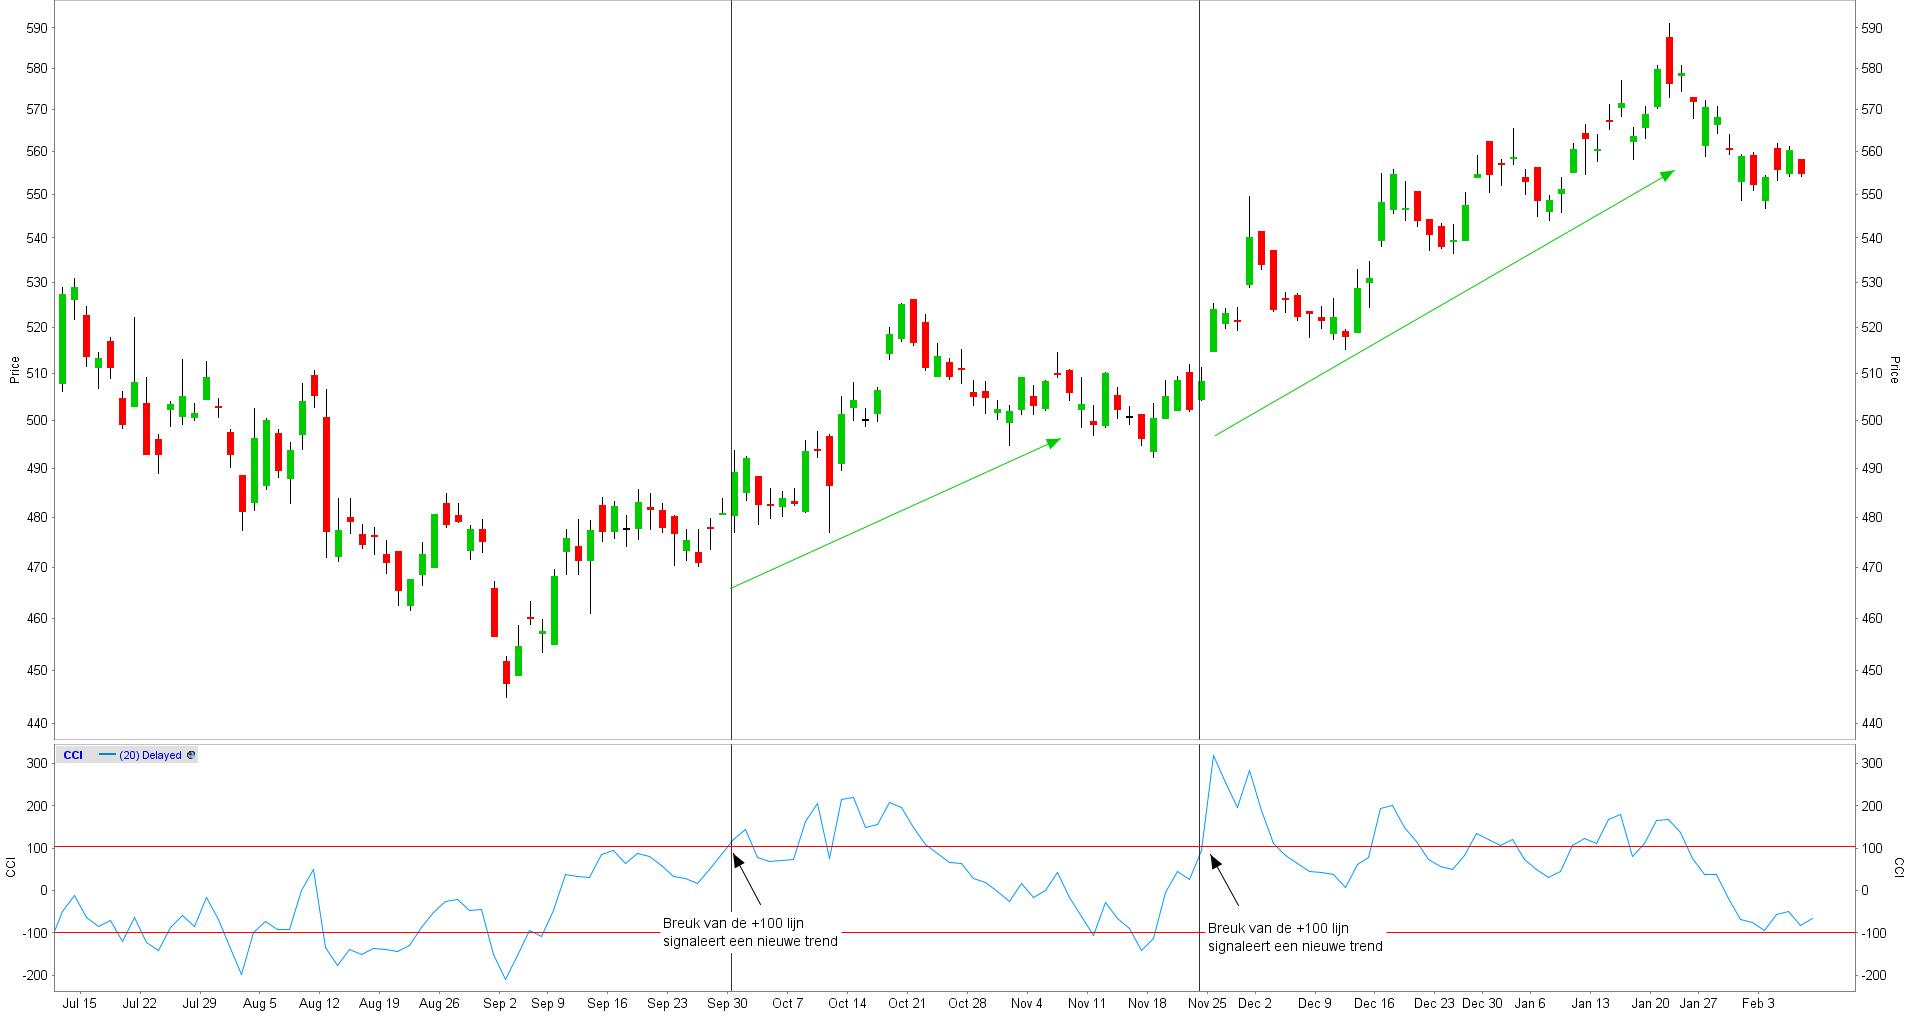 Commodity channel index opwaartse trend